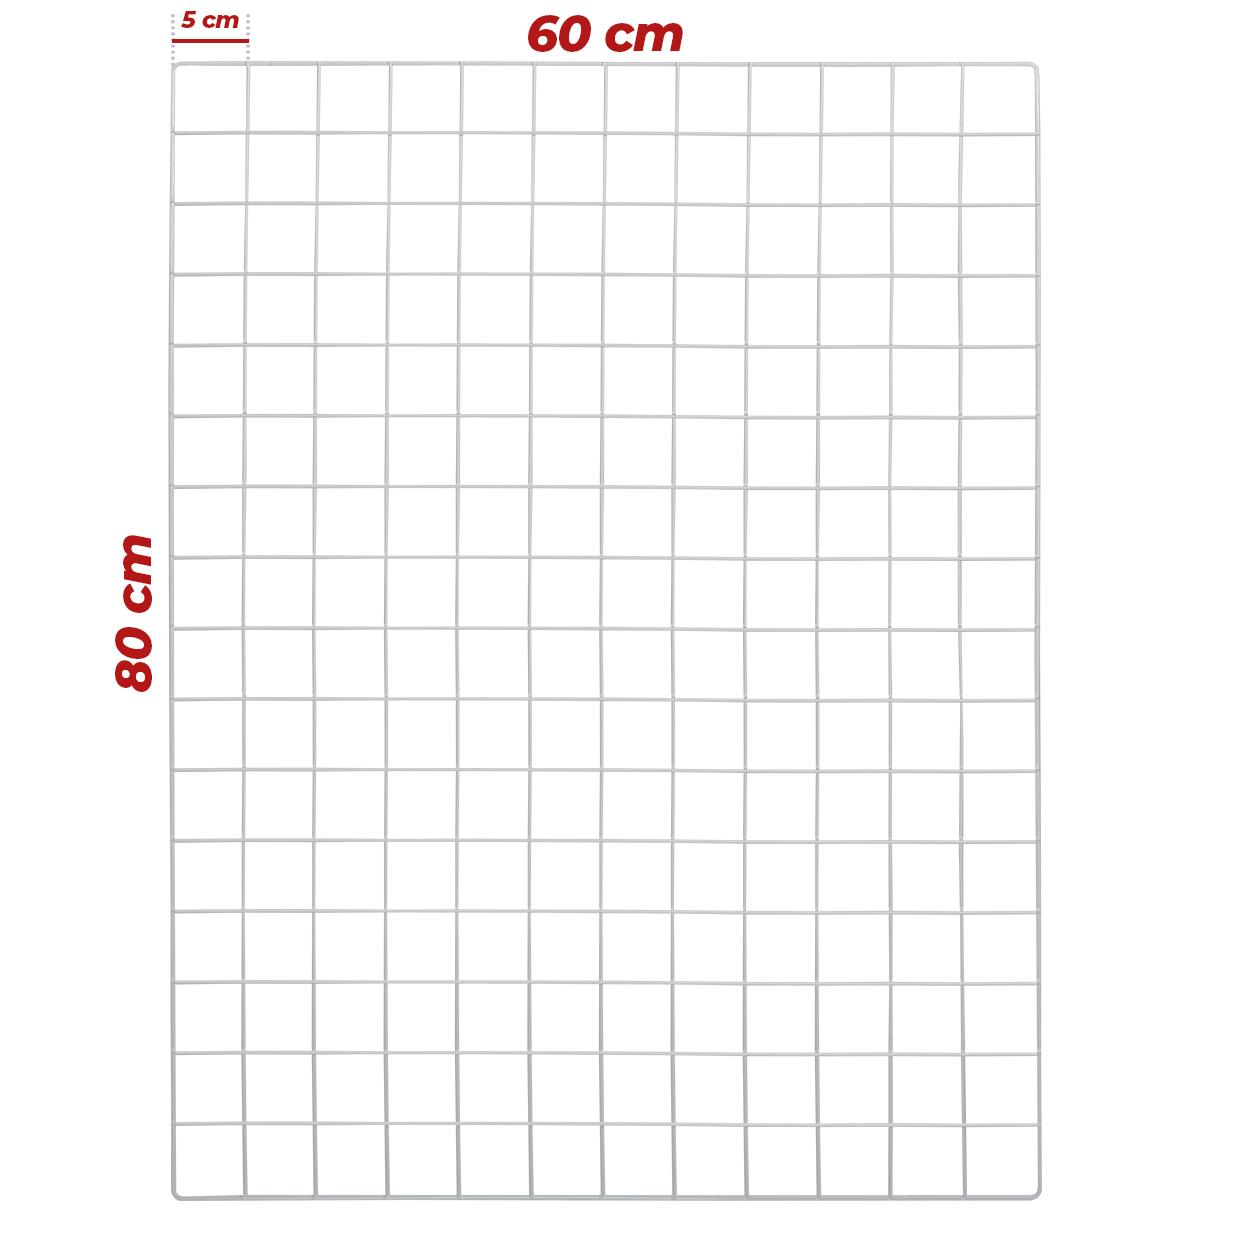 Kit Tela 60x80cm + 10 Prendedores Cores Sortidas